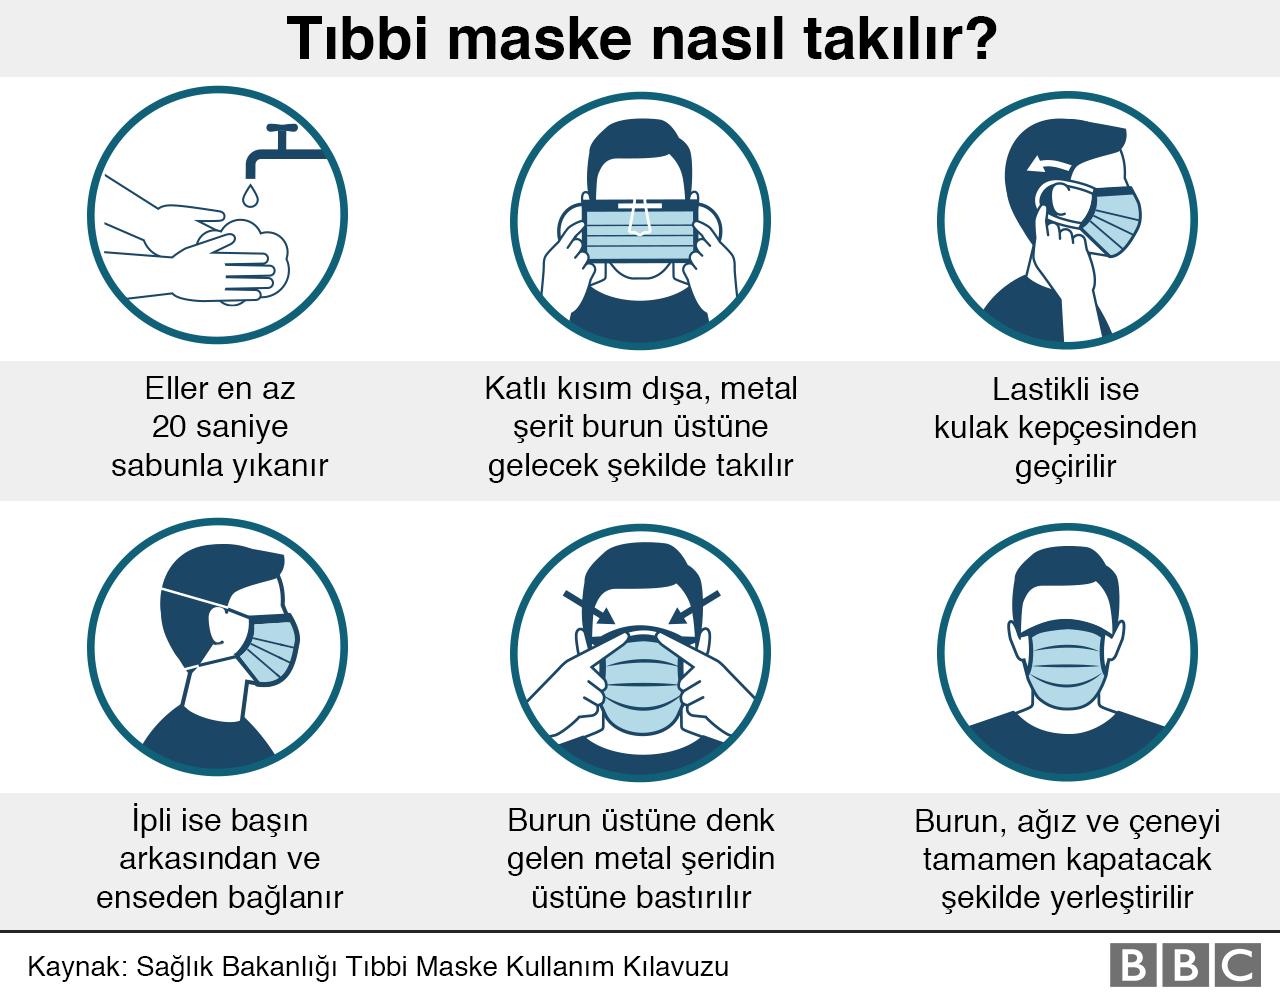 Tıbbi maske